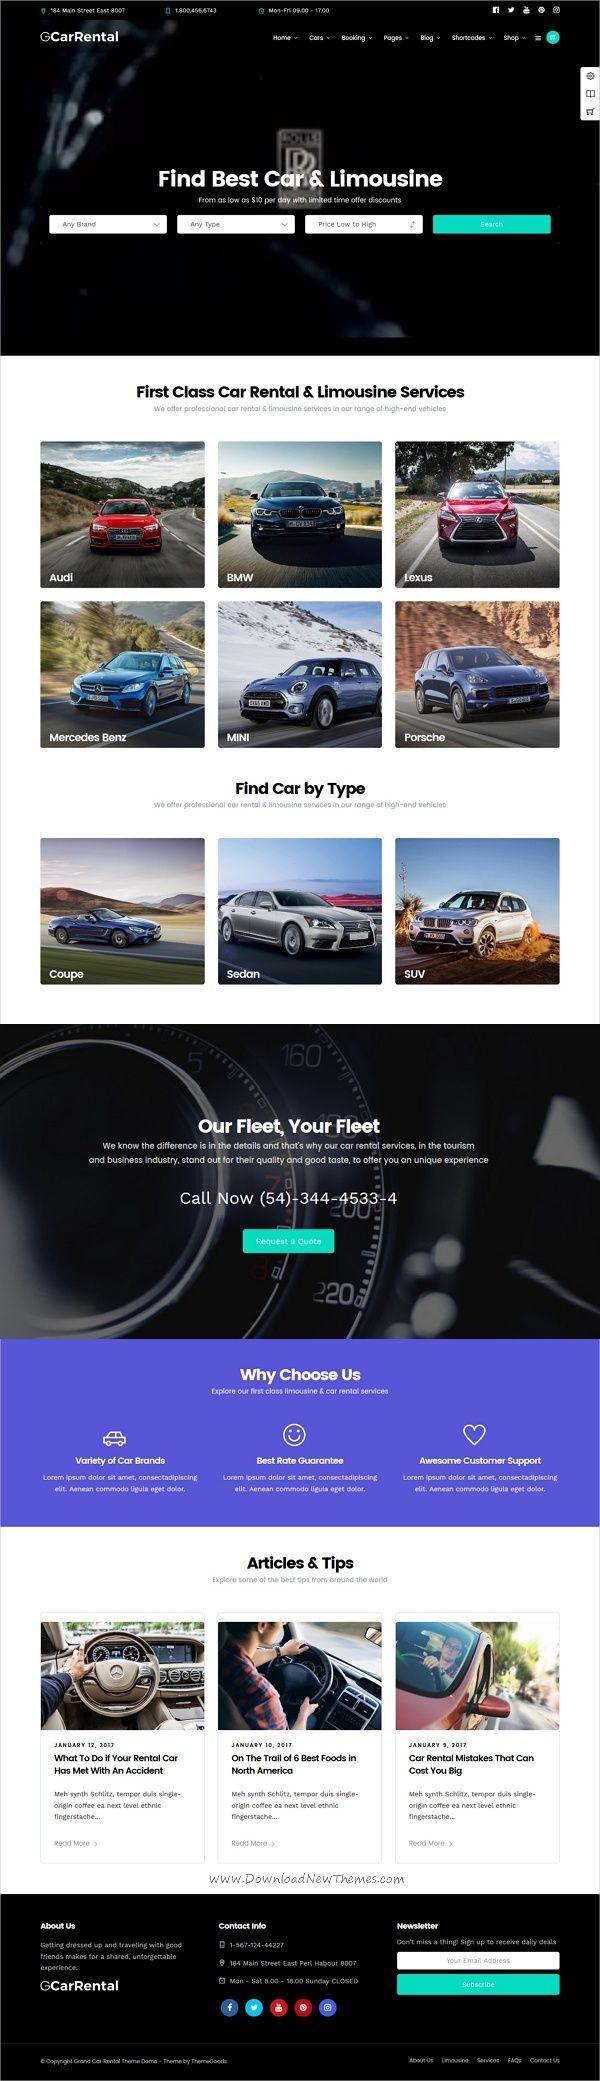 Best 25 Limousine Car Ideas On Pinterest Sporting Auto Royce